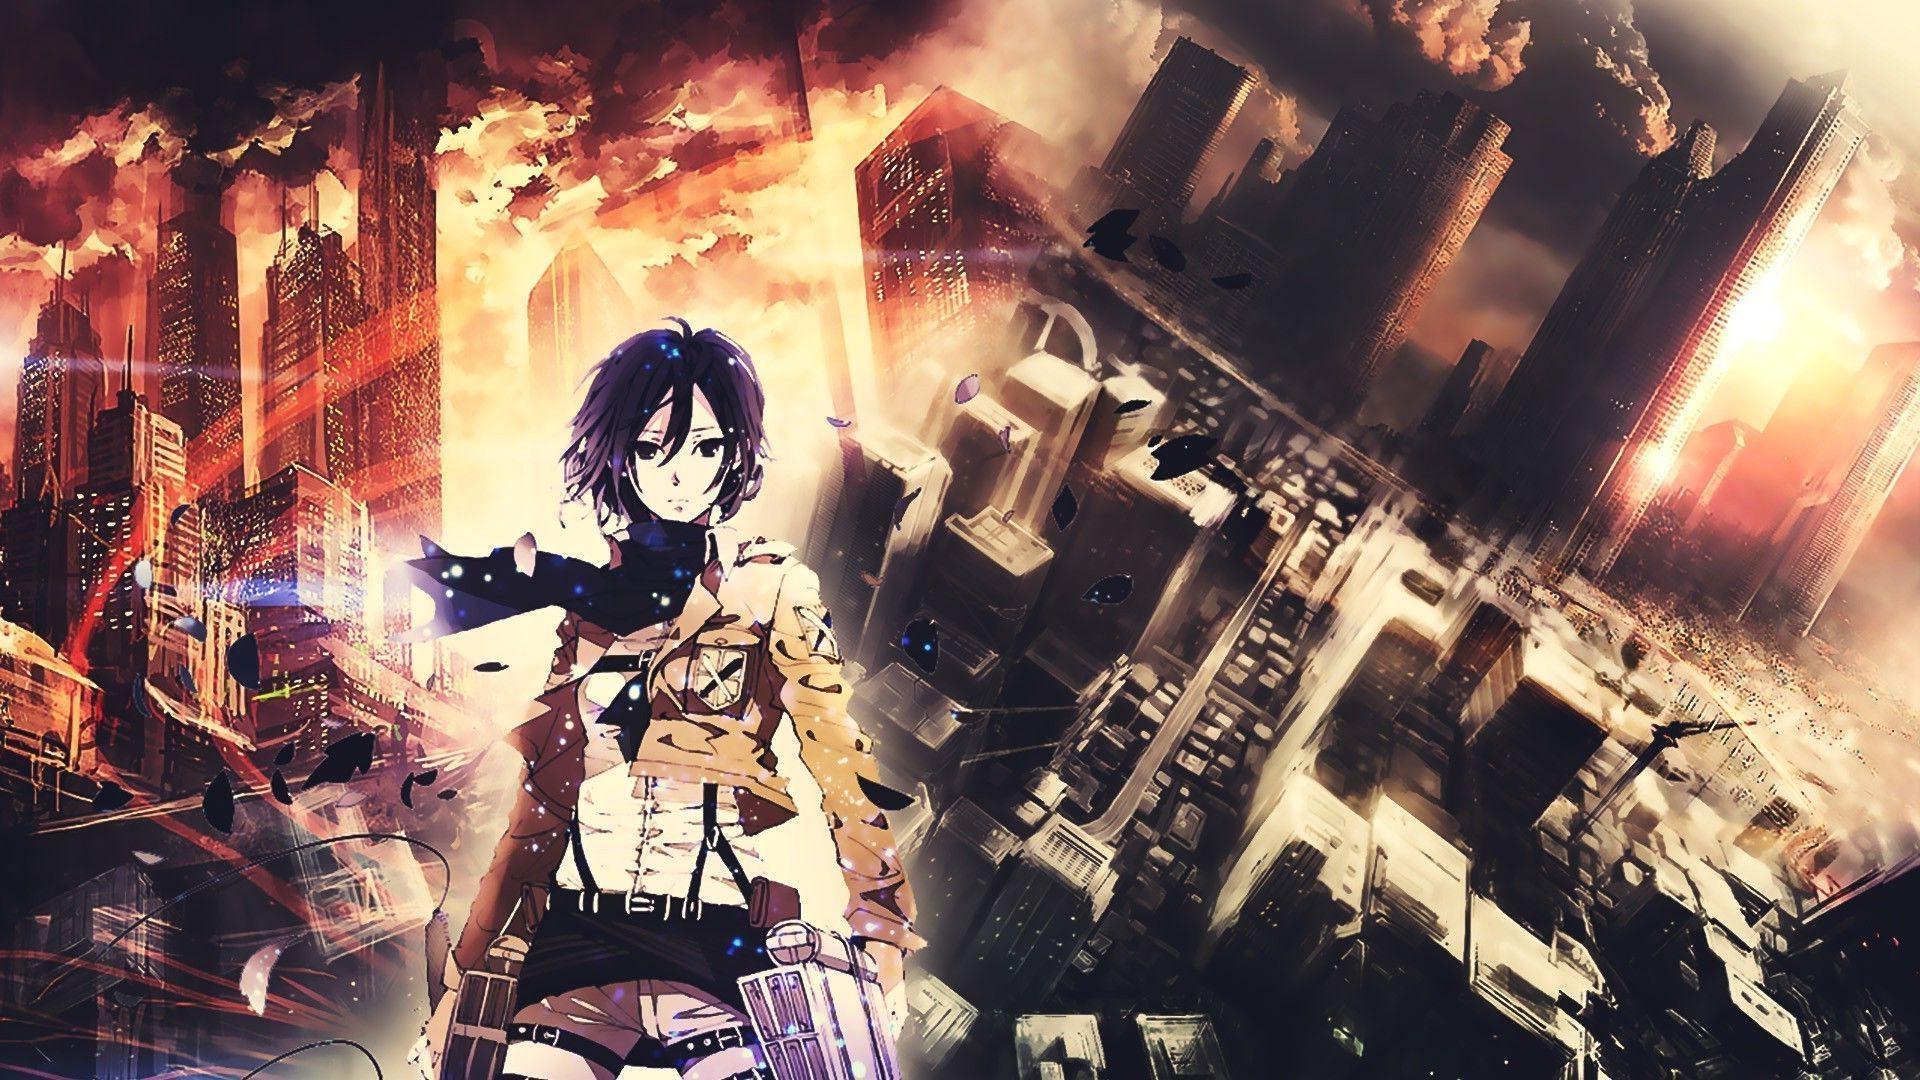 Wallpaper 1920x1080 Px Anime Girls Mikasa Ackerman